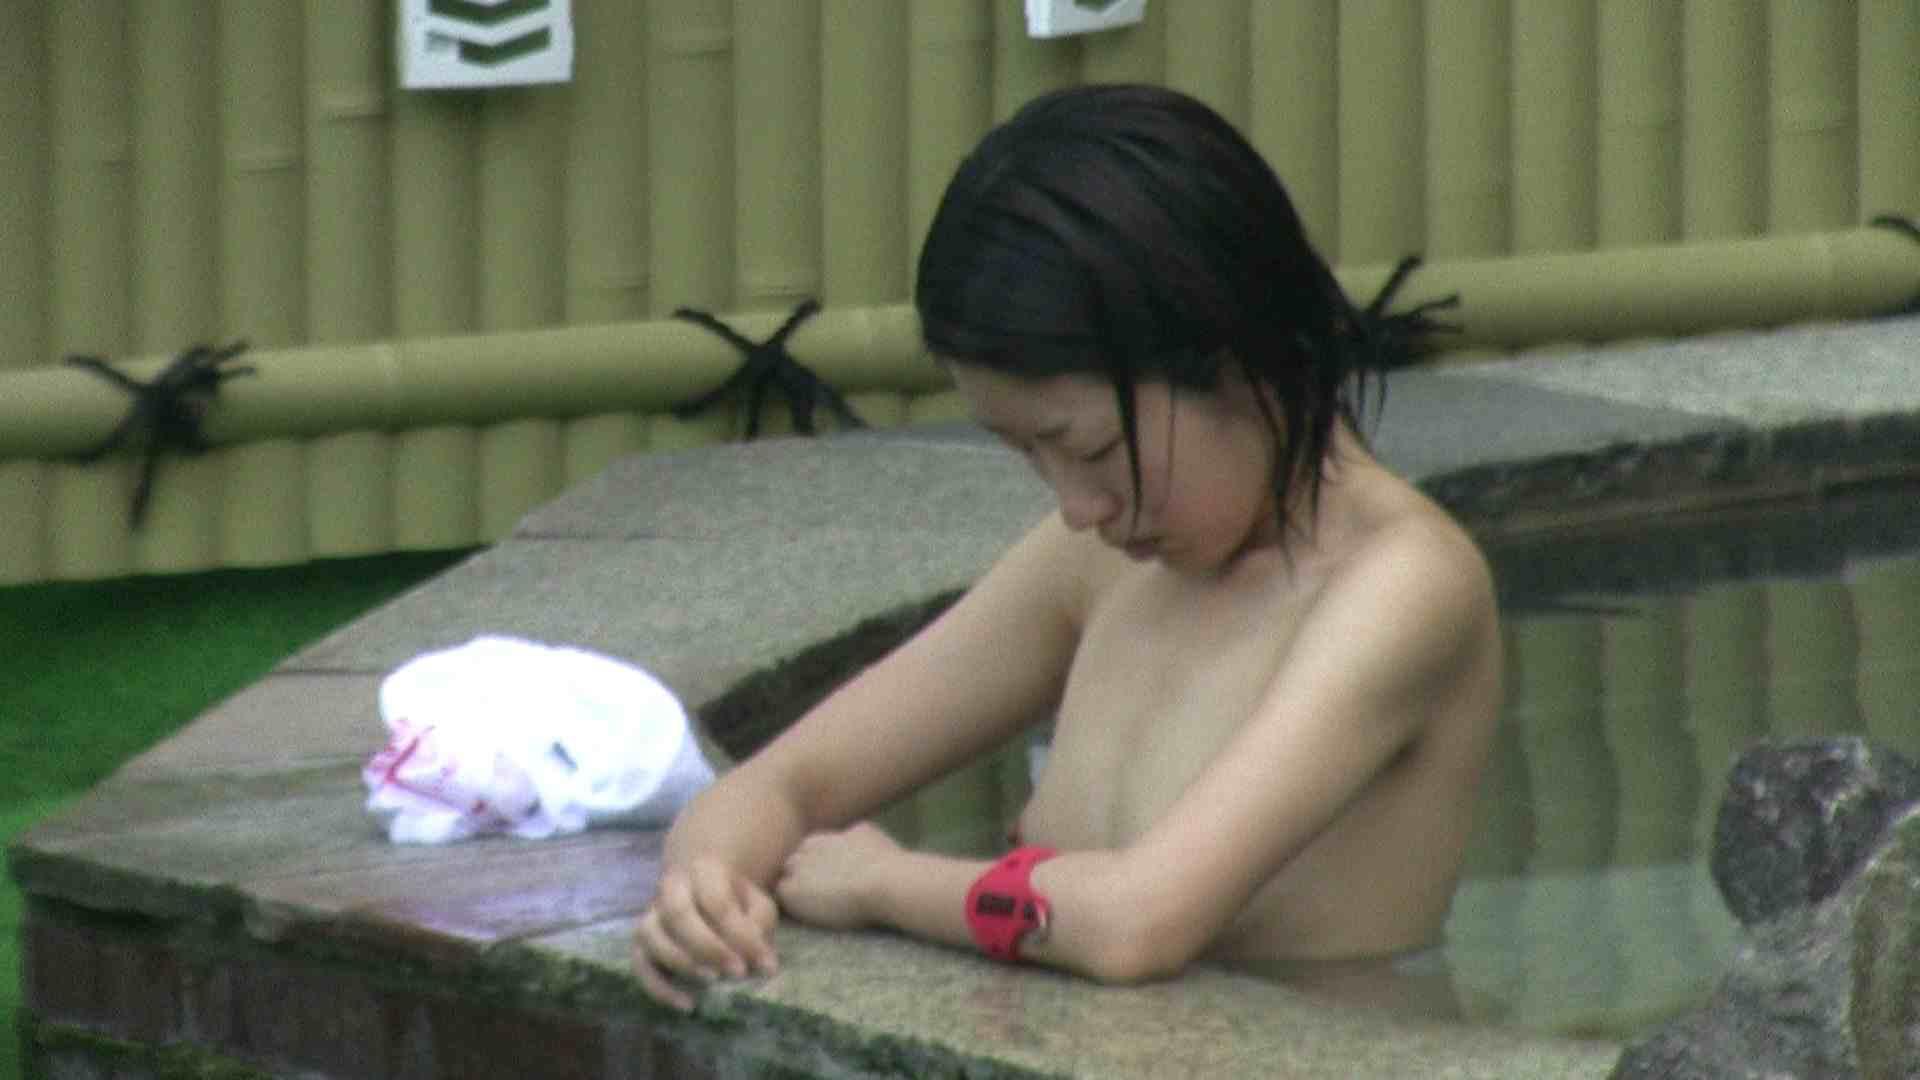 Aquaな露天風呂Vol.133 0  46連発 44